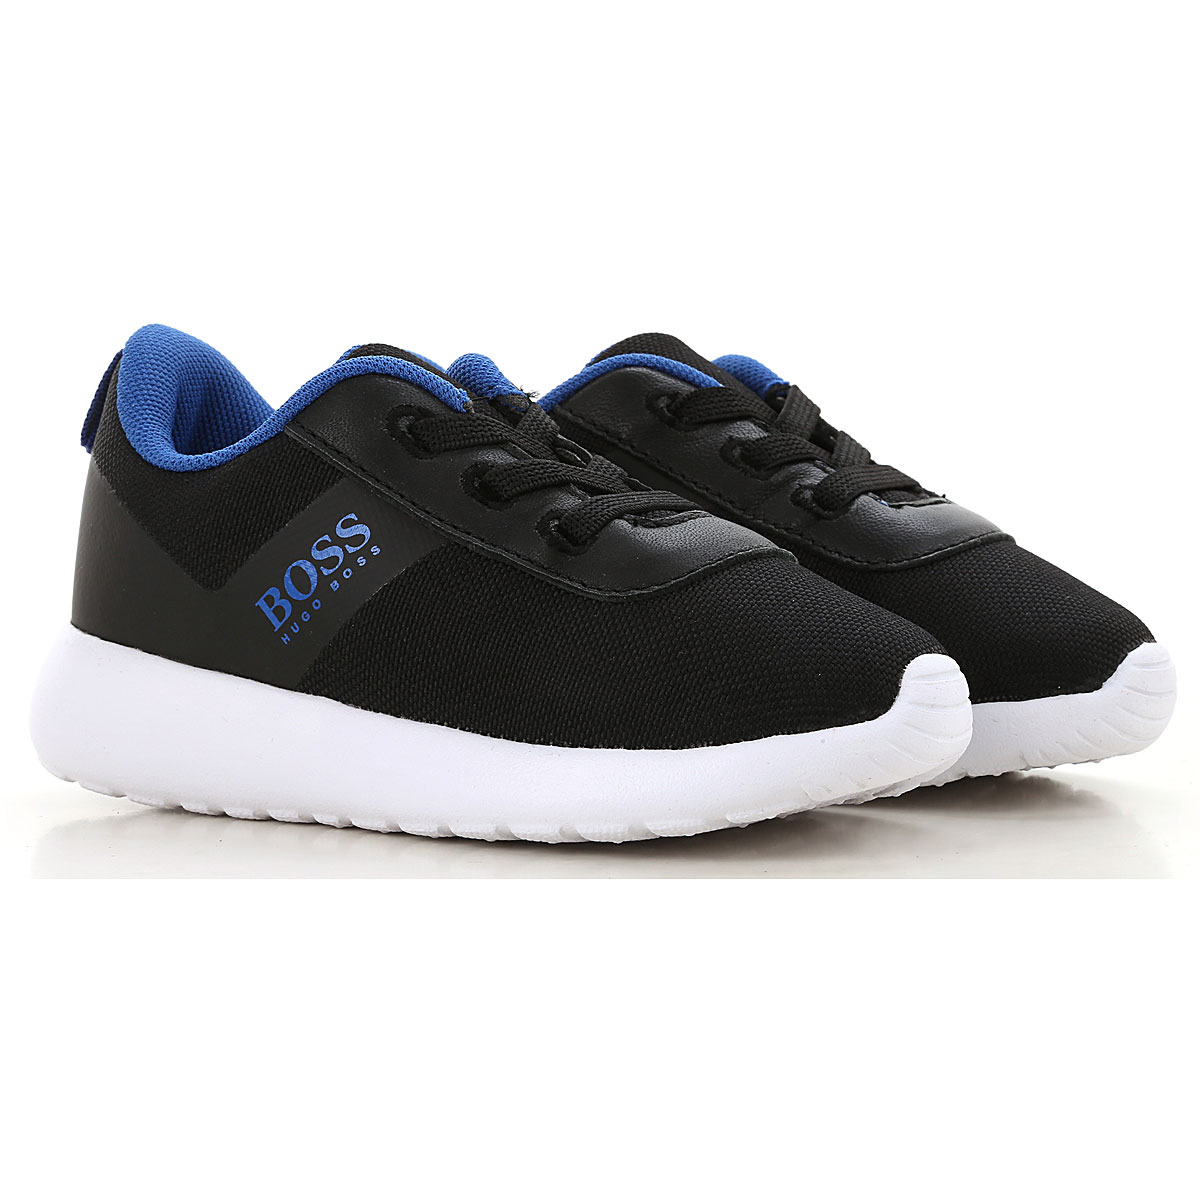 Image of Hugo Boss Sneakers, Black, polyester, 2017, 20 21 22 23 24 25 26